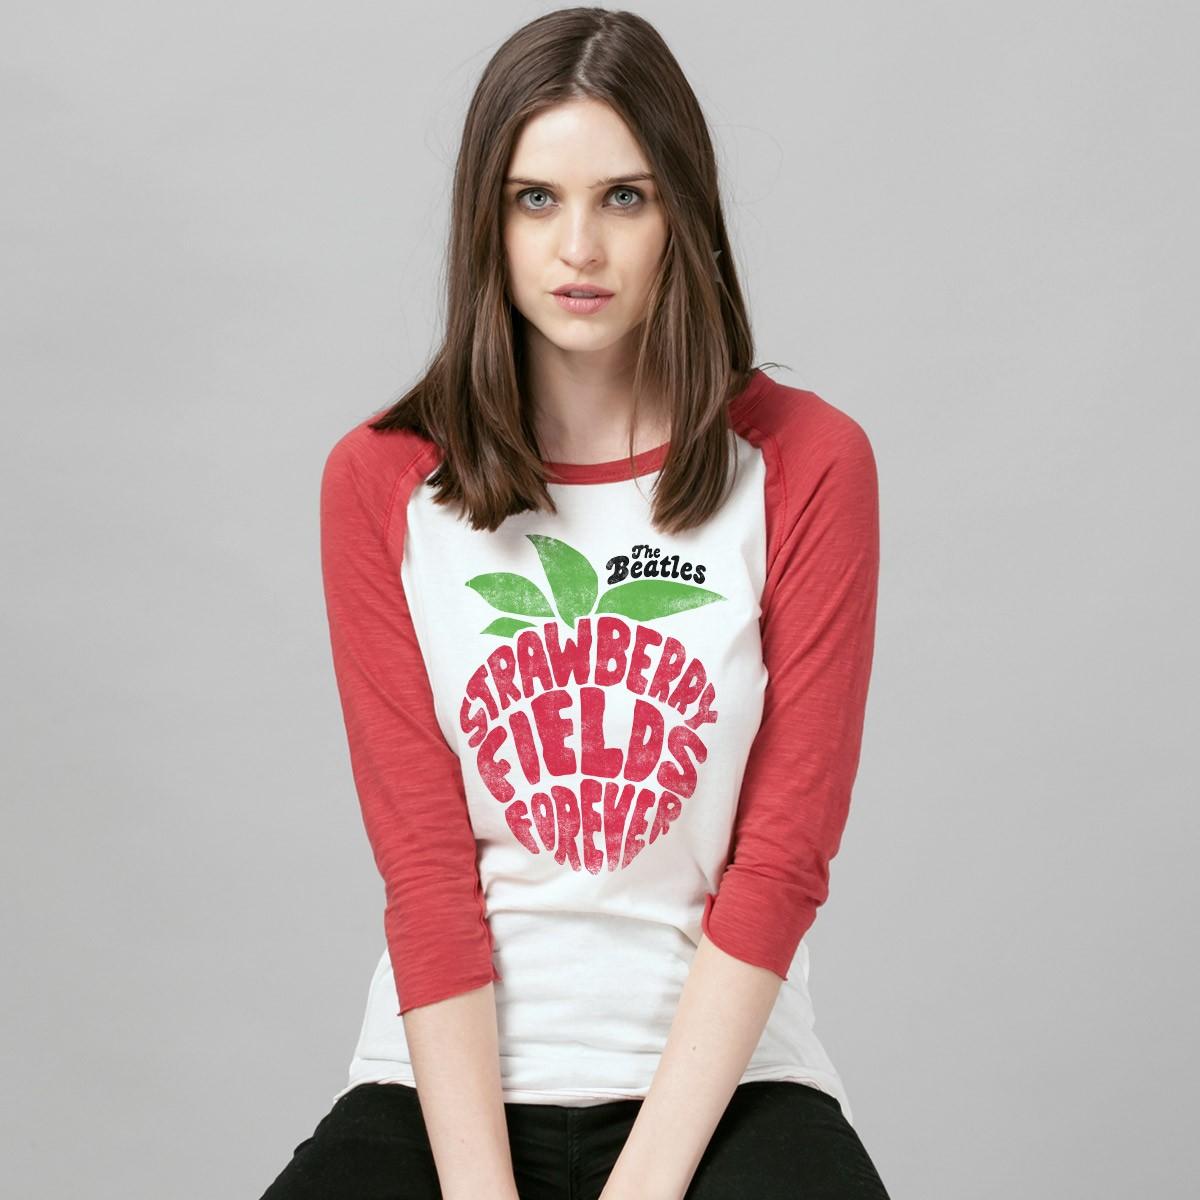 Camiseta Manga Longa Feminina The Beatles Strawberry Fields Forever